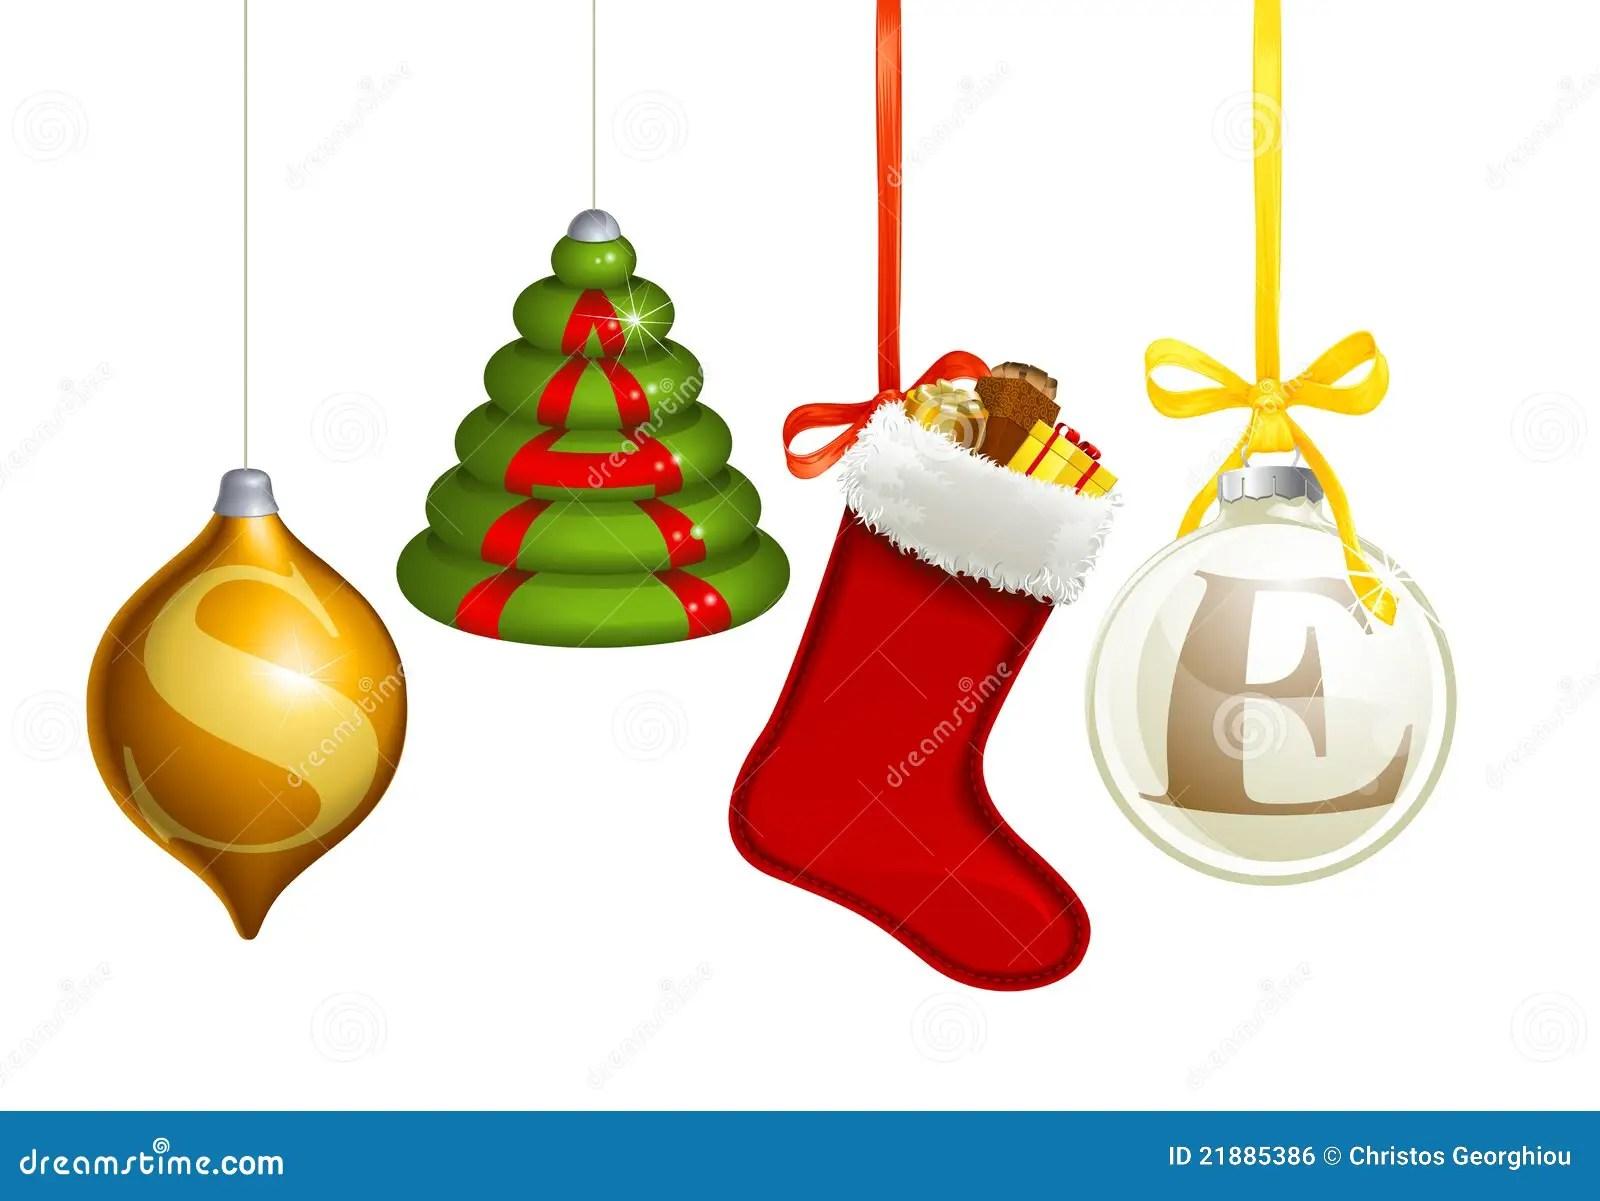 sale christmas decorations